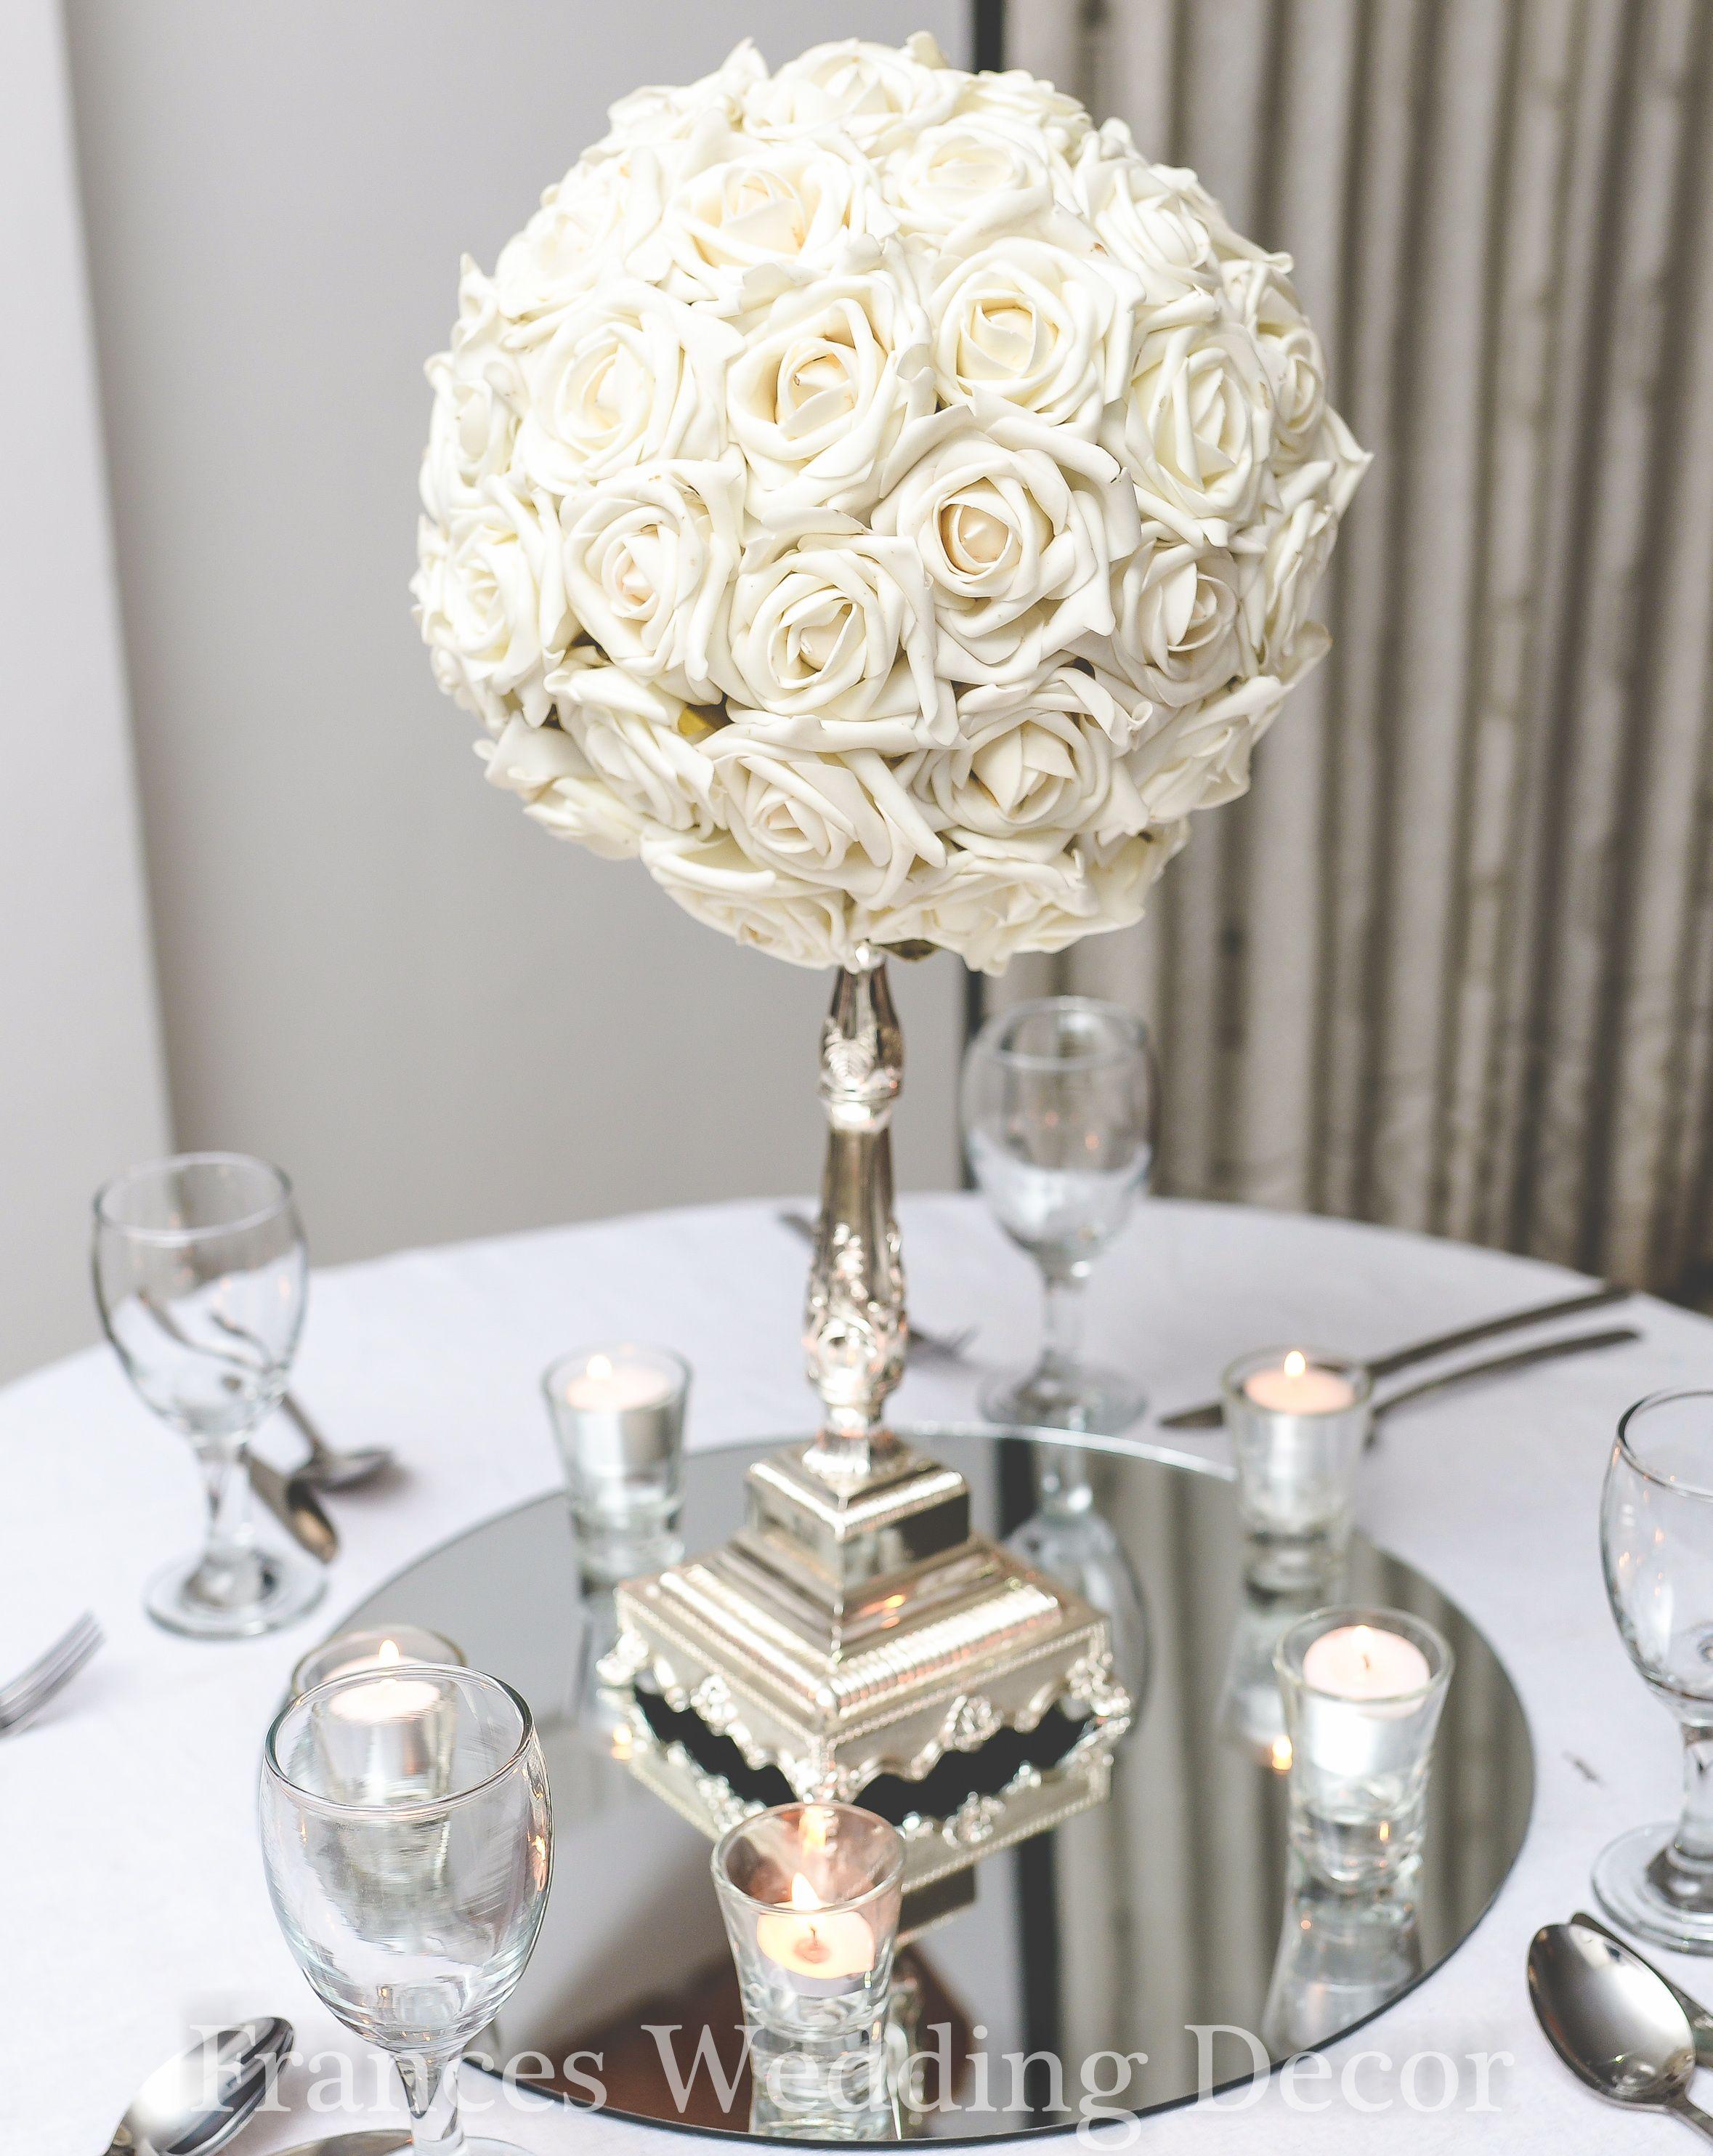 Srilankan wedding - frances wedding decor - weddings in Sri Lanka ... for Sri Lankan Wedding Table Decorations  157uhy